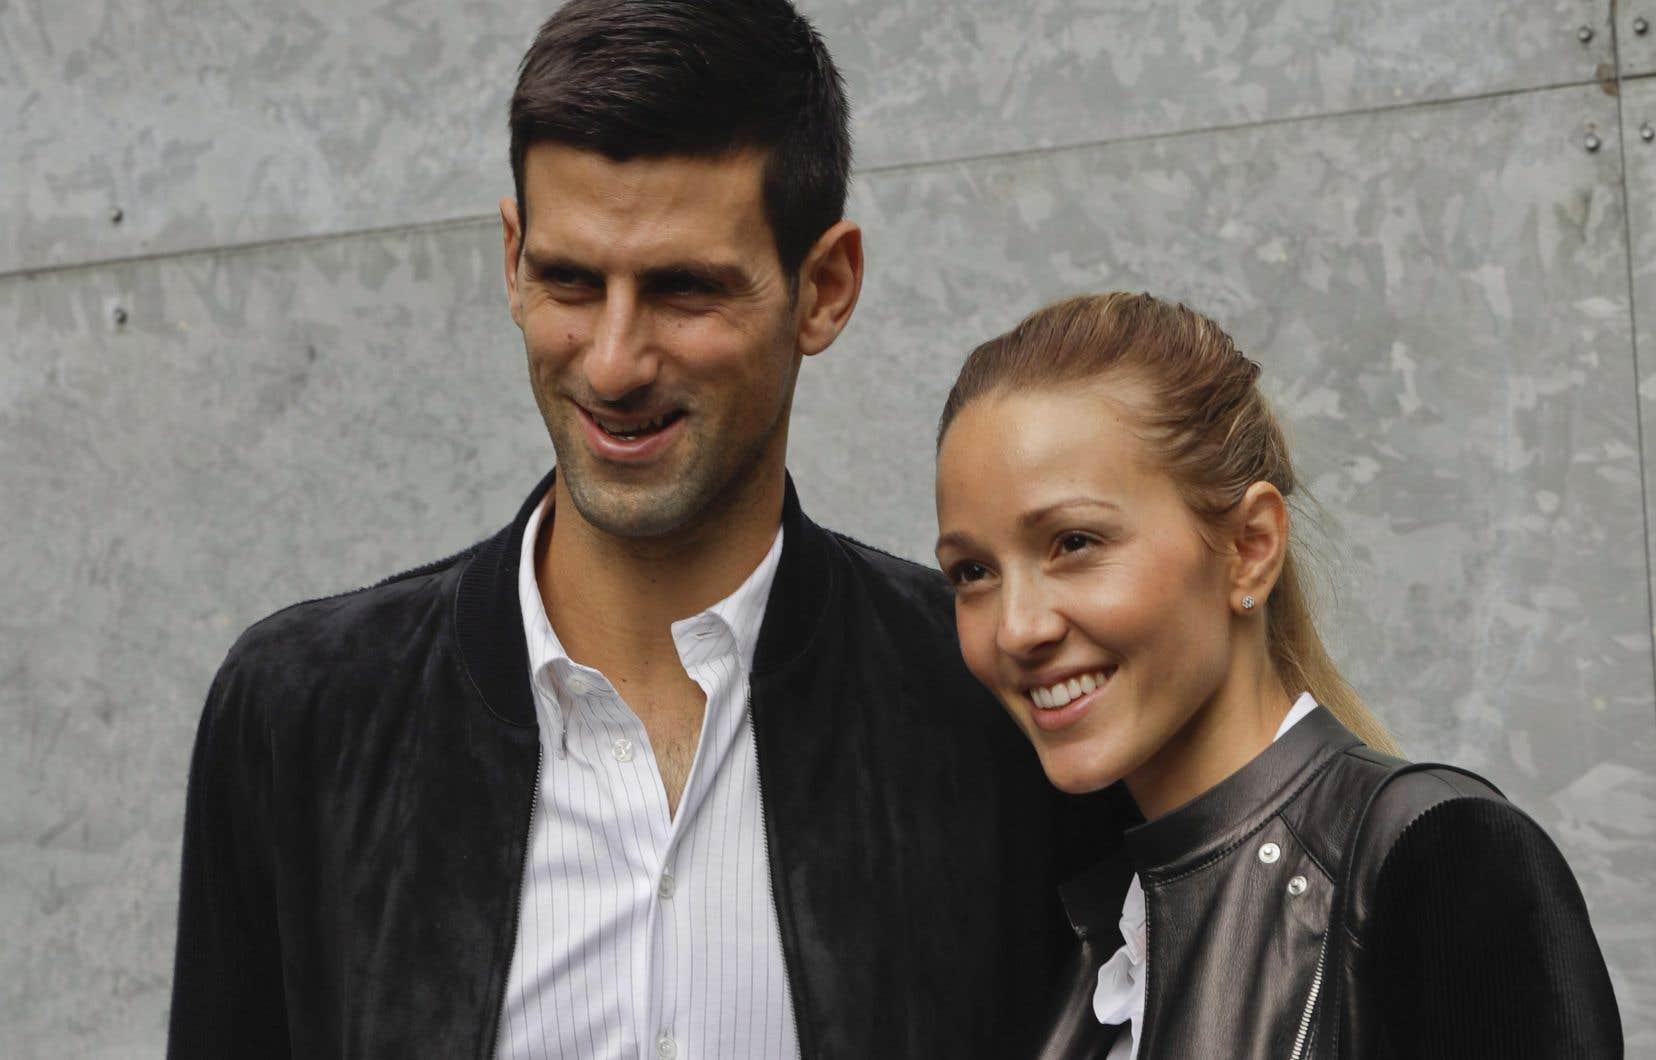 Novak Djokovic et son épouse Jelena ontété déclarés positifs au coronavirus mardi.